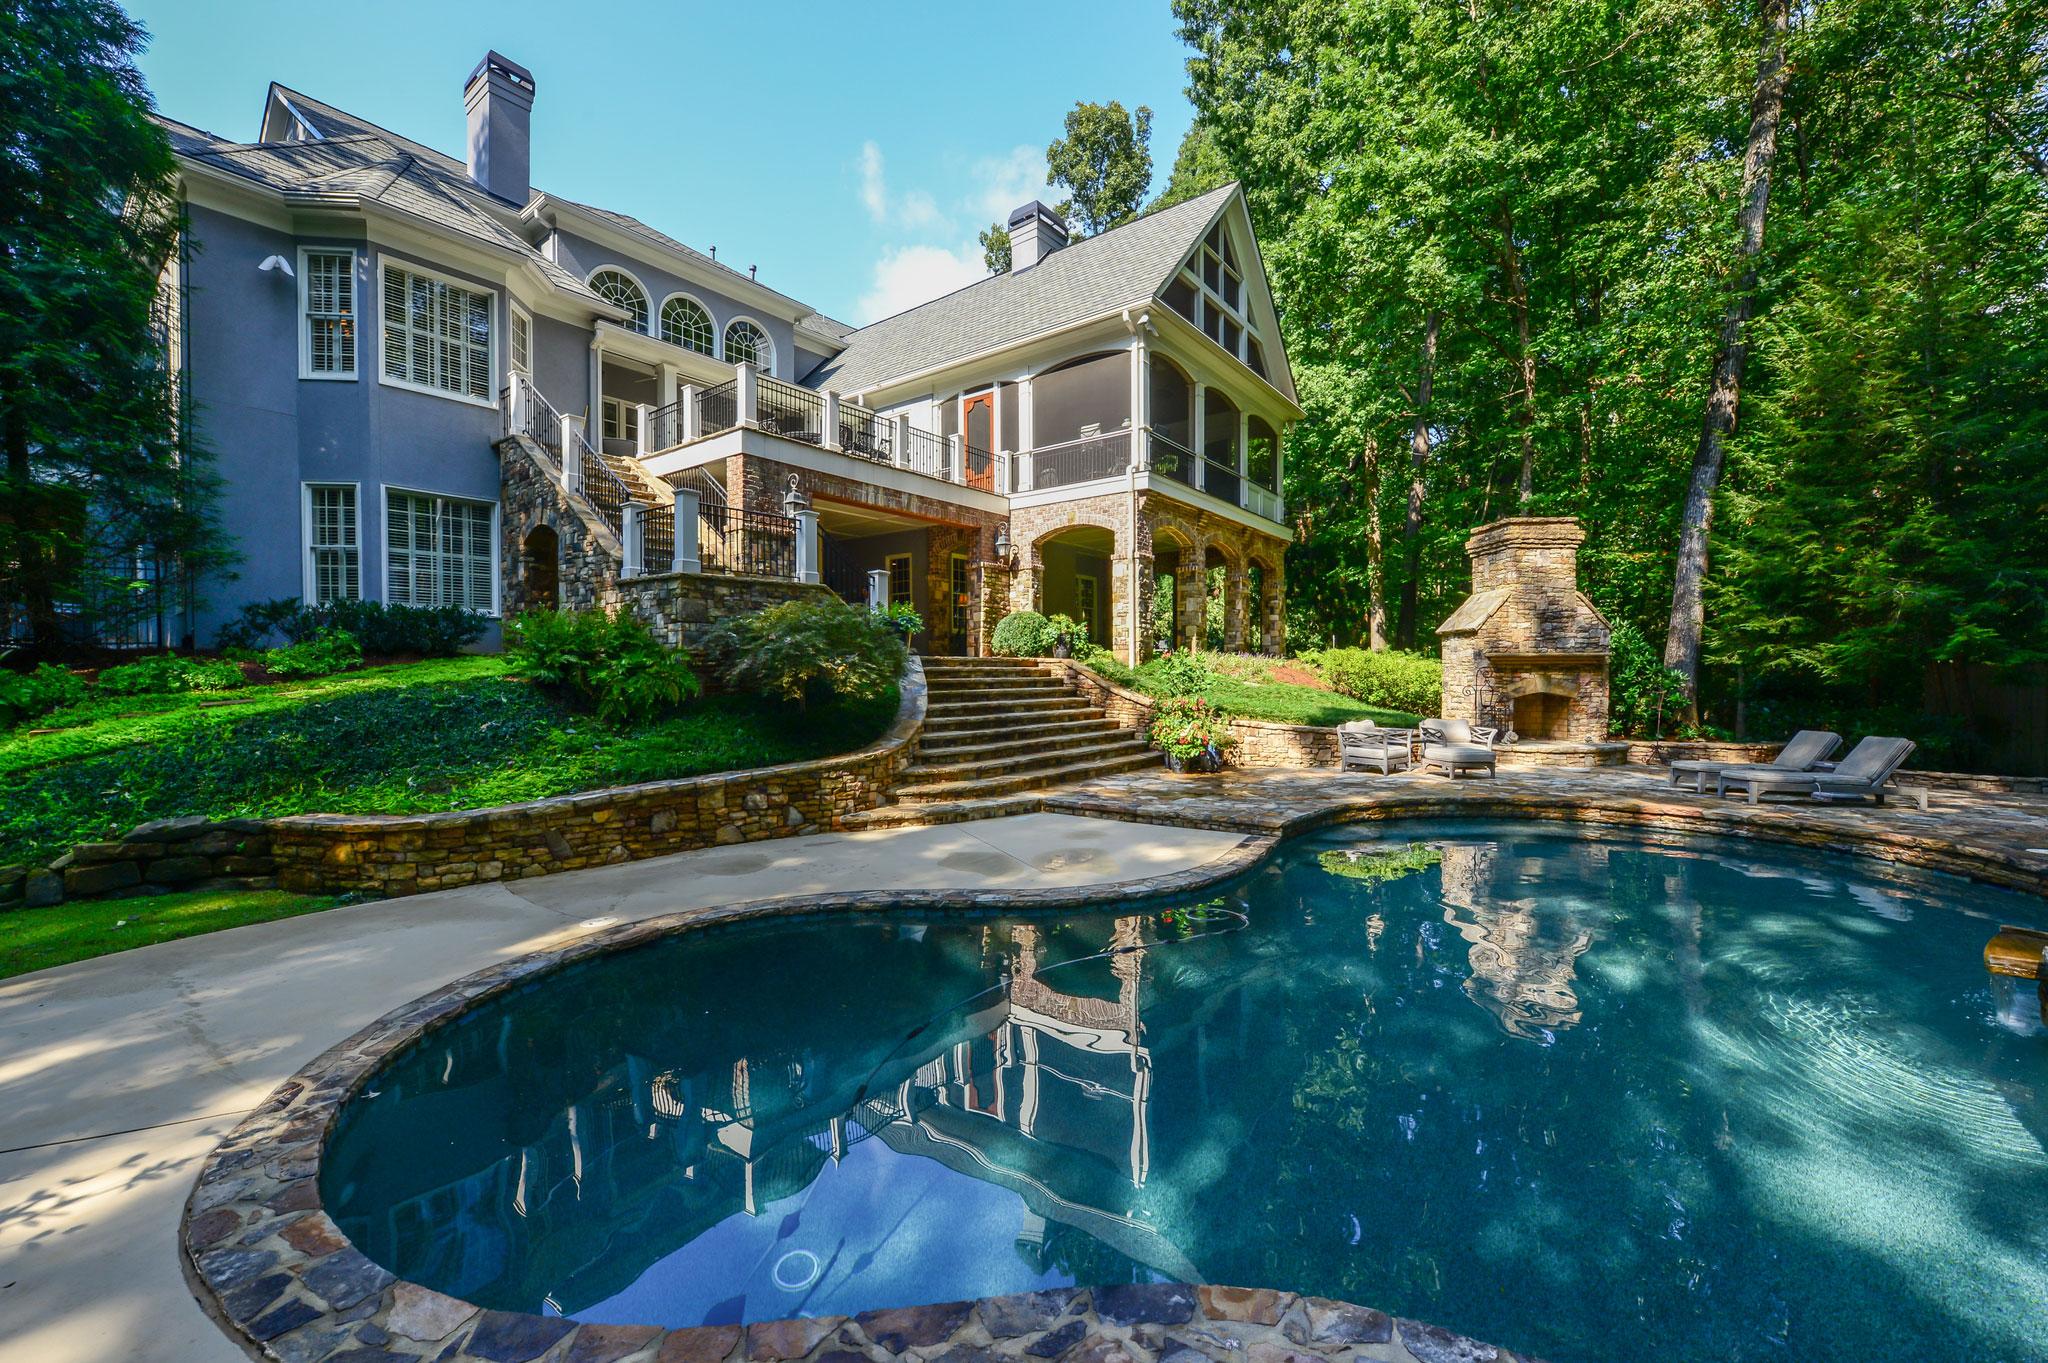 Real estate agents in Atlanta